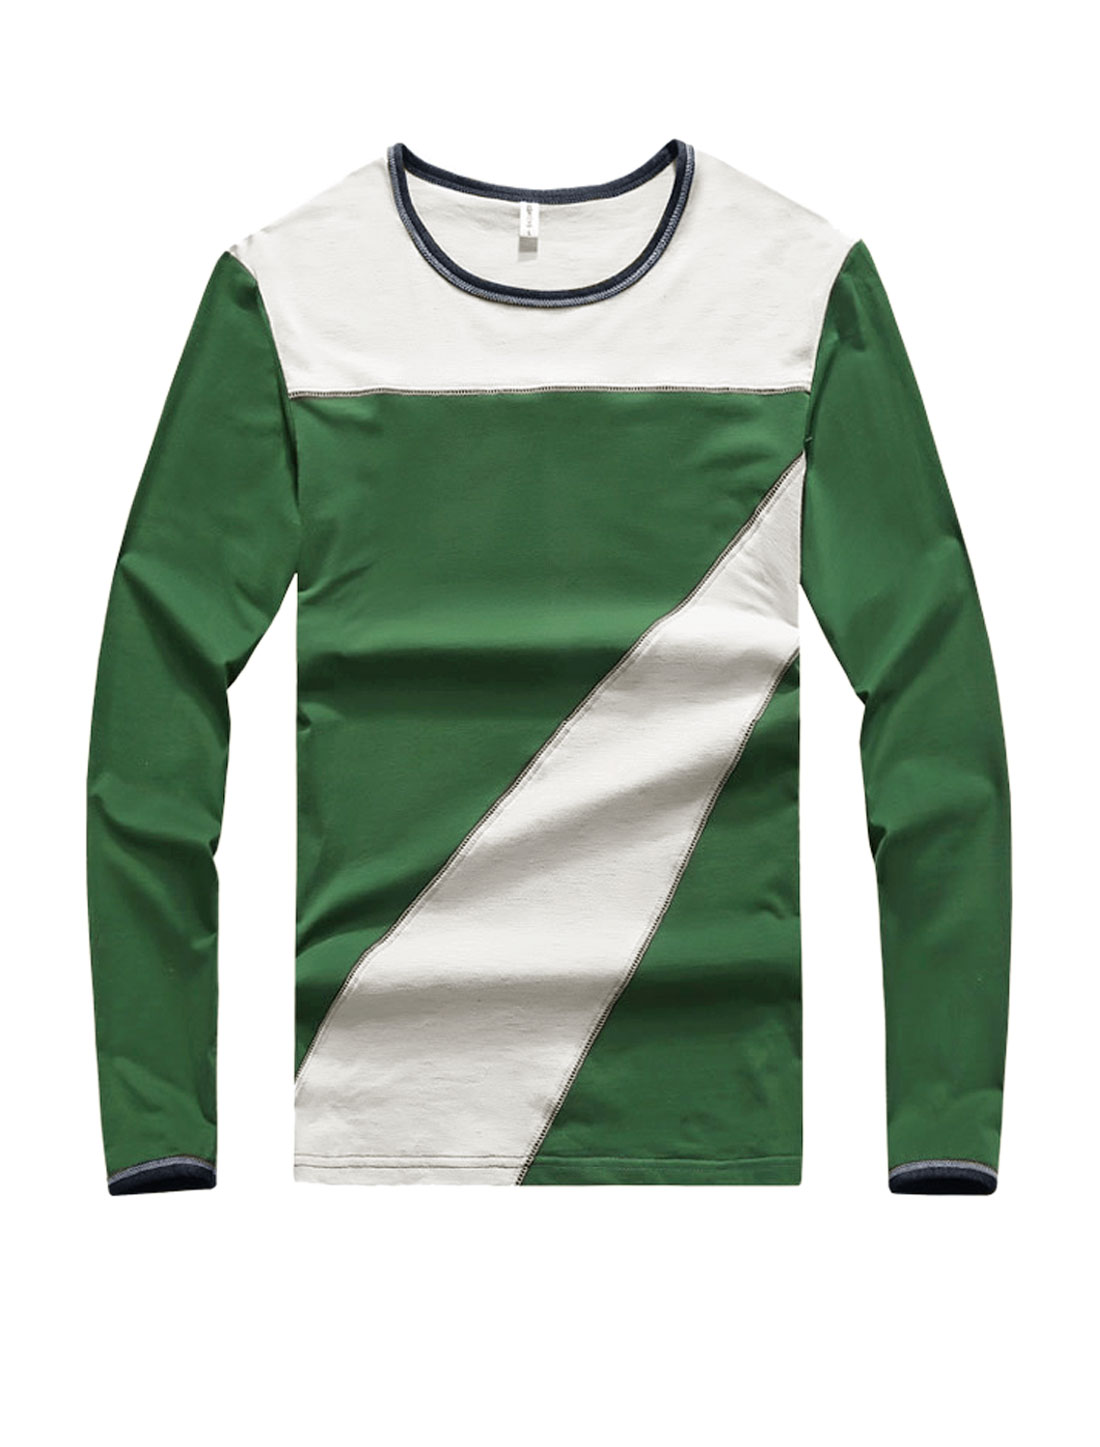 Men Crew Neck Long Sleeves Color Block Slim Fit T-Shirt Green S